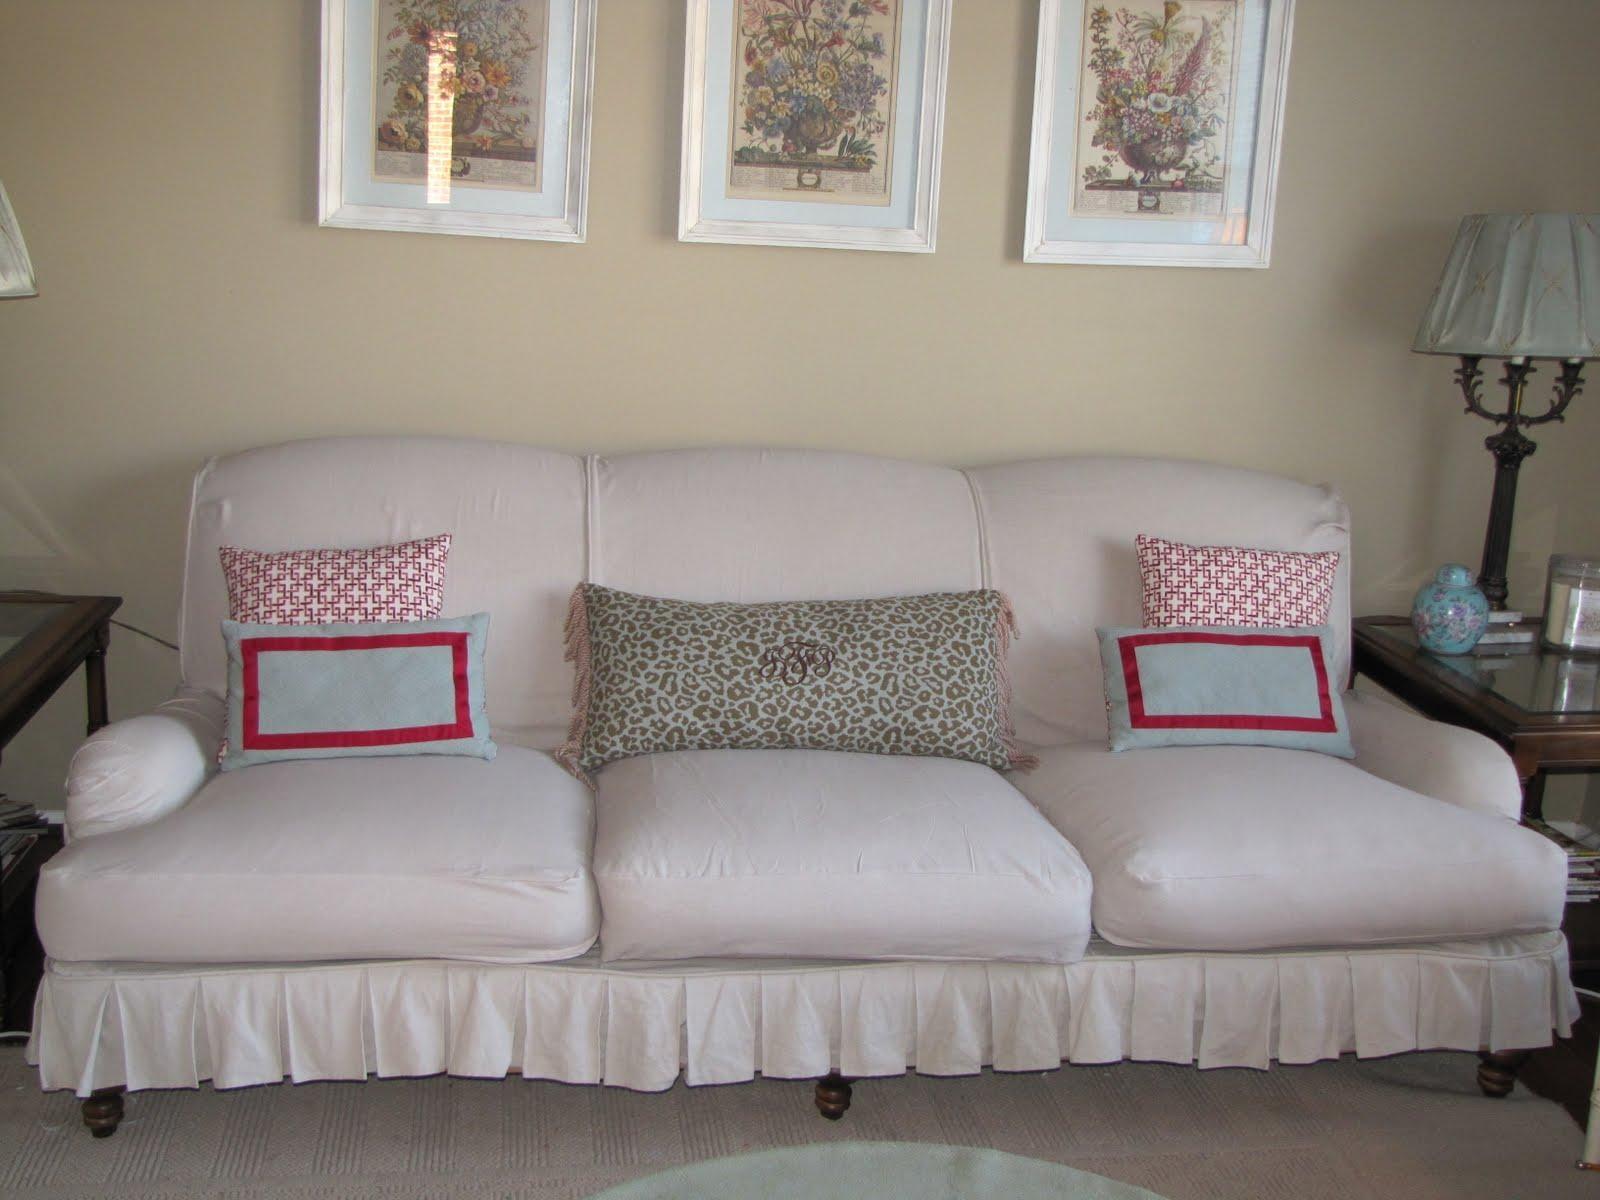 Bibbidi Bobbidi Beautiful: How To Slipcover Sofas And Chairs In Slipcovers For Sofas And Chairs (Image 1 of 20)